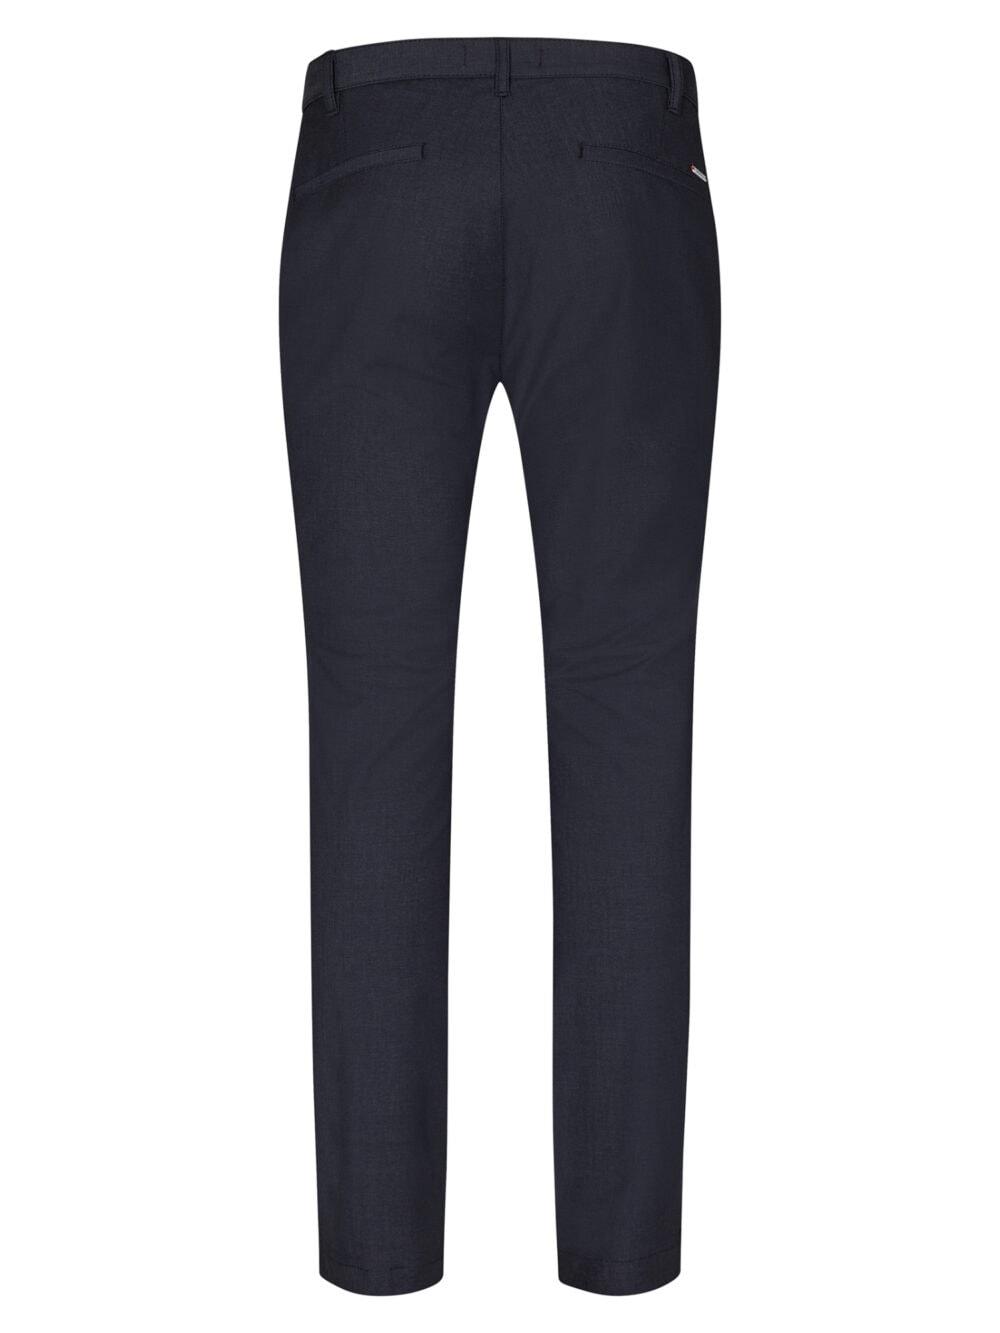 Sunwill Extreme Flexibility Pants 503139-7731 Navy